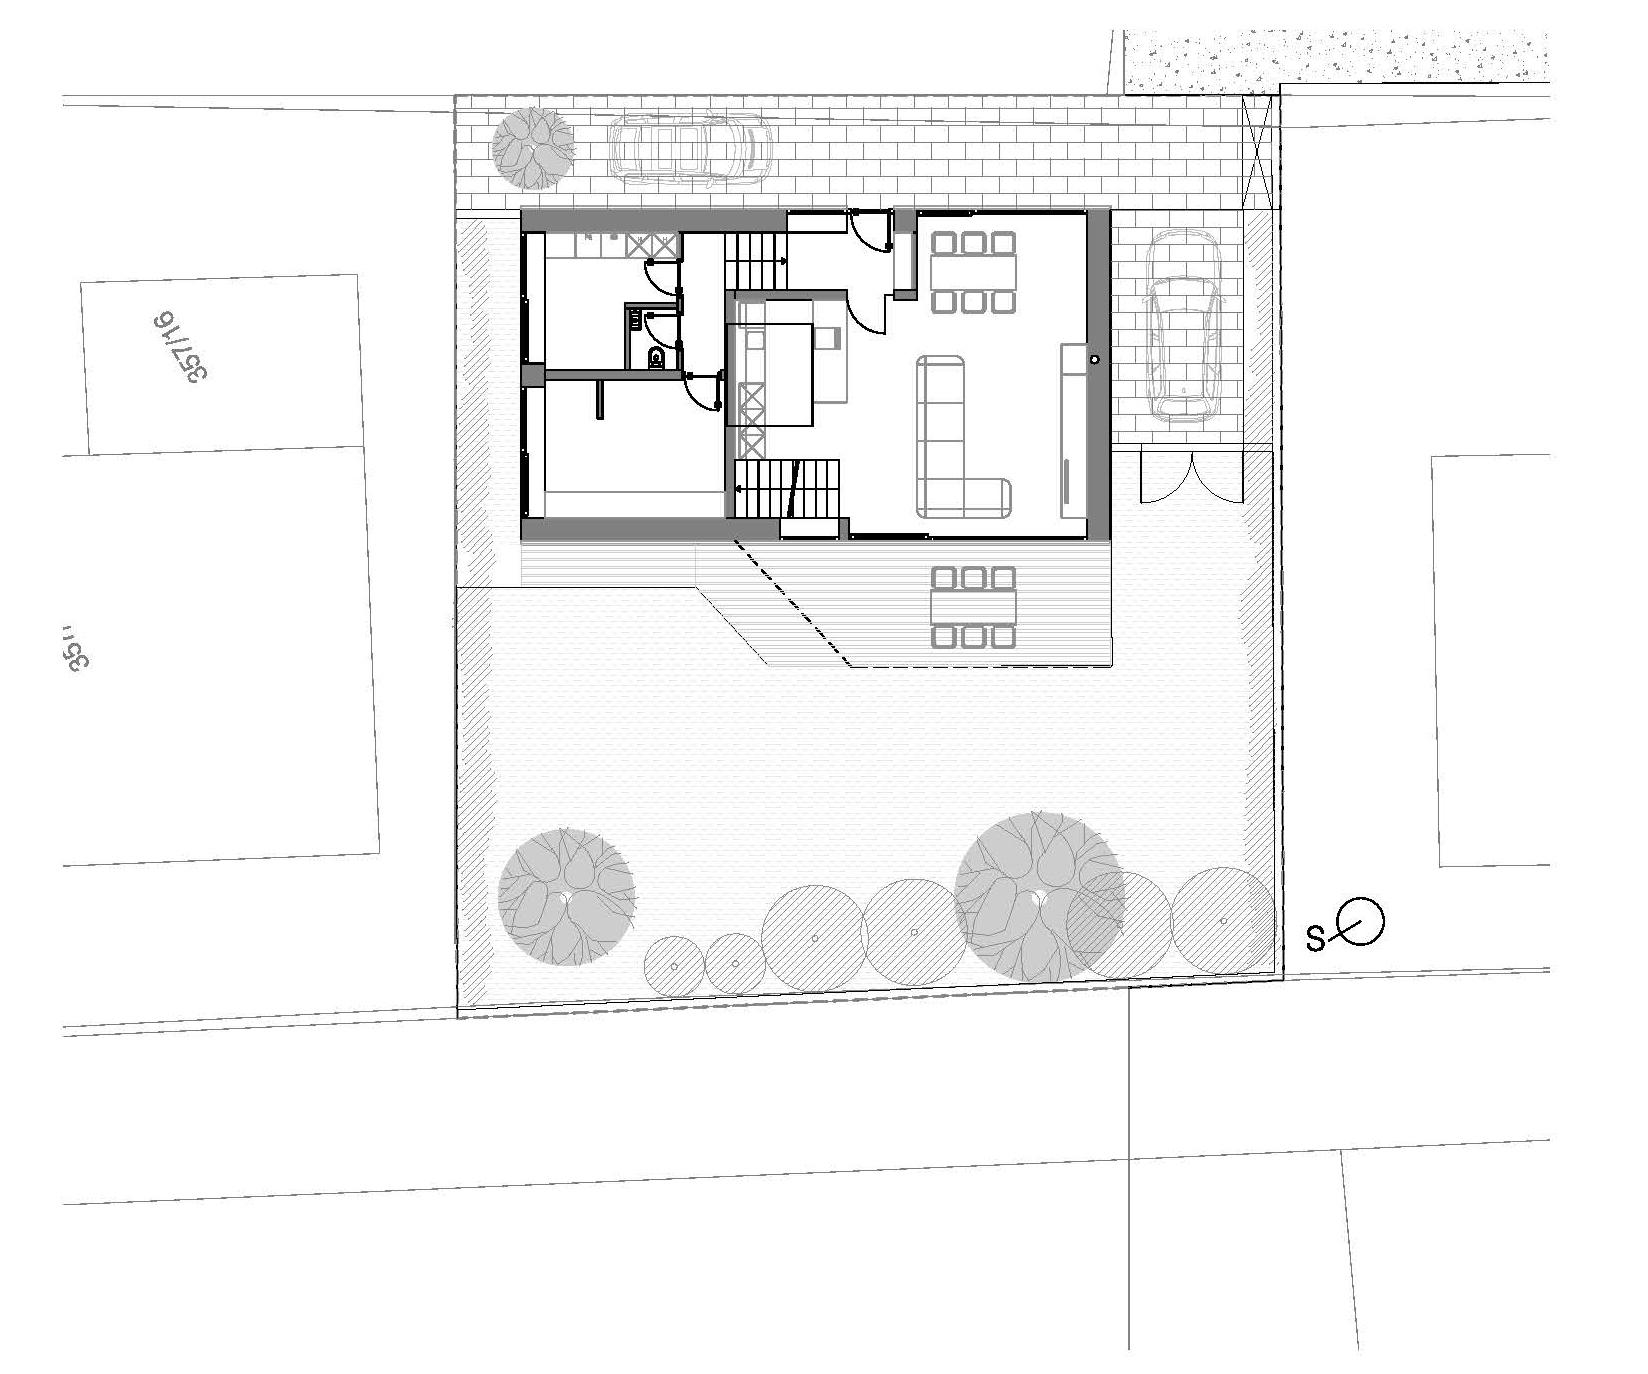 Finest Gallery Of Mezzanine House Elastik Hikikomori With Mezzanine Floor Plan  House.